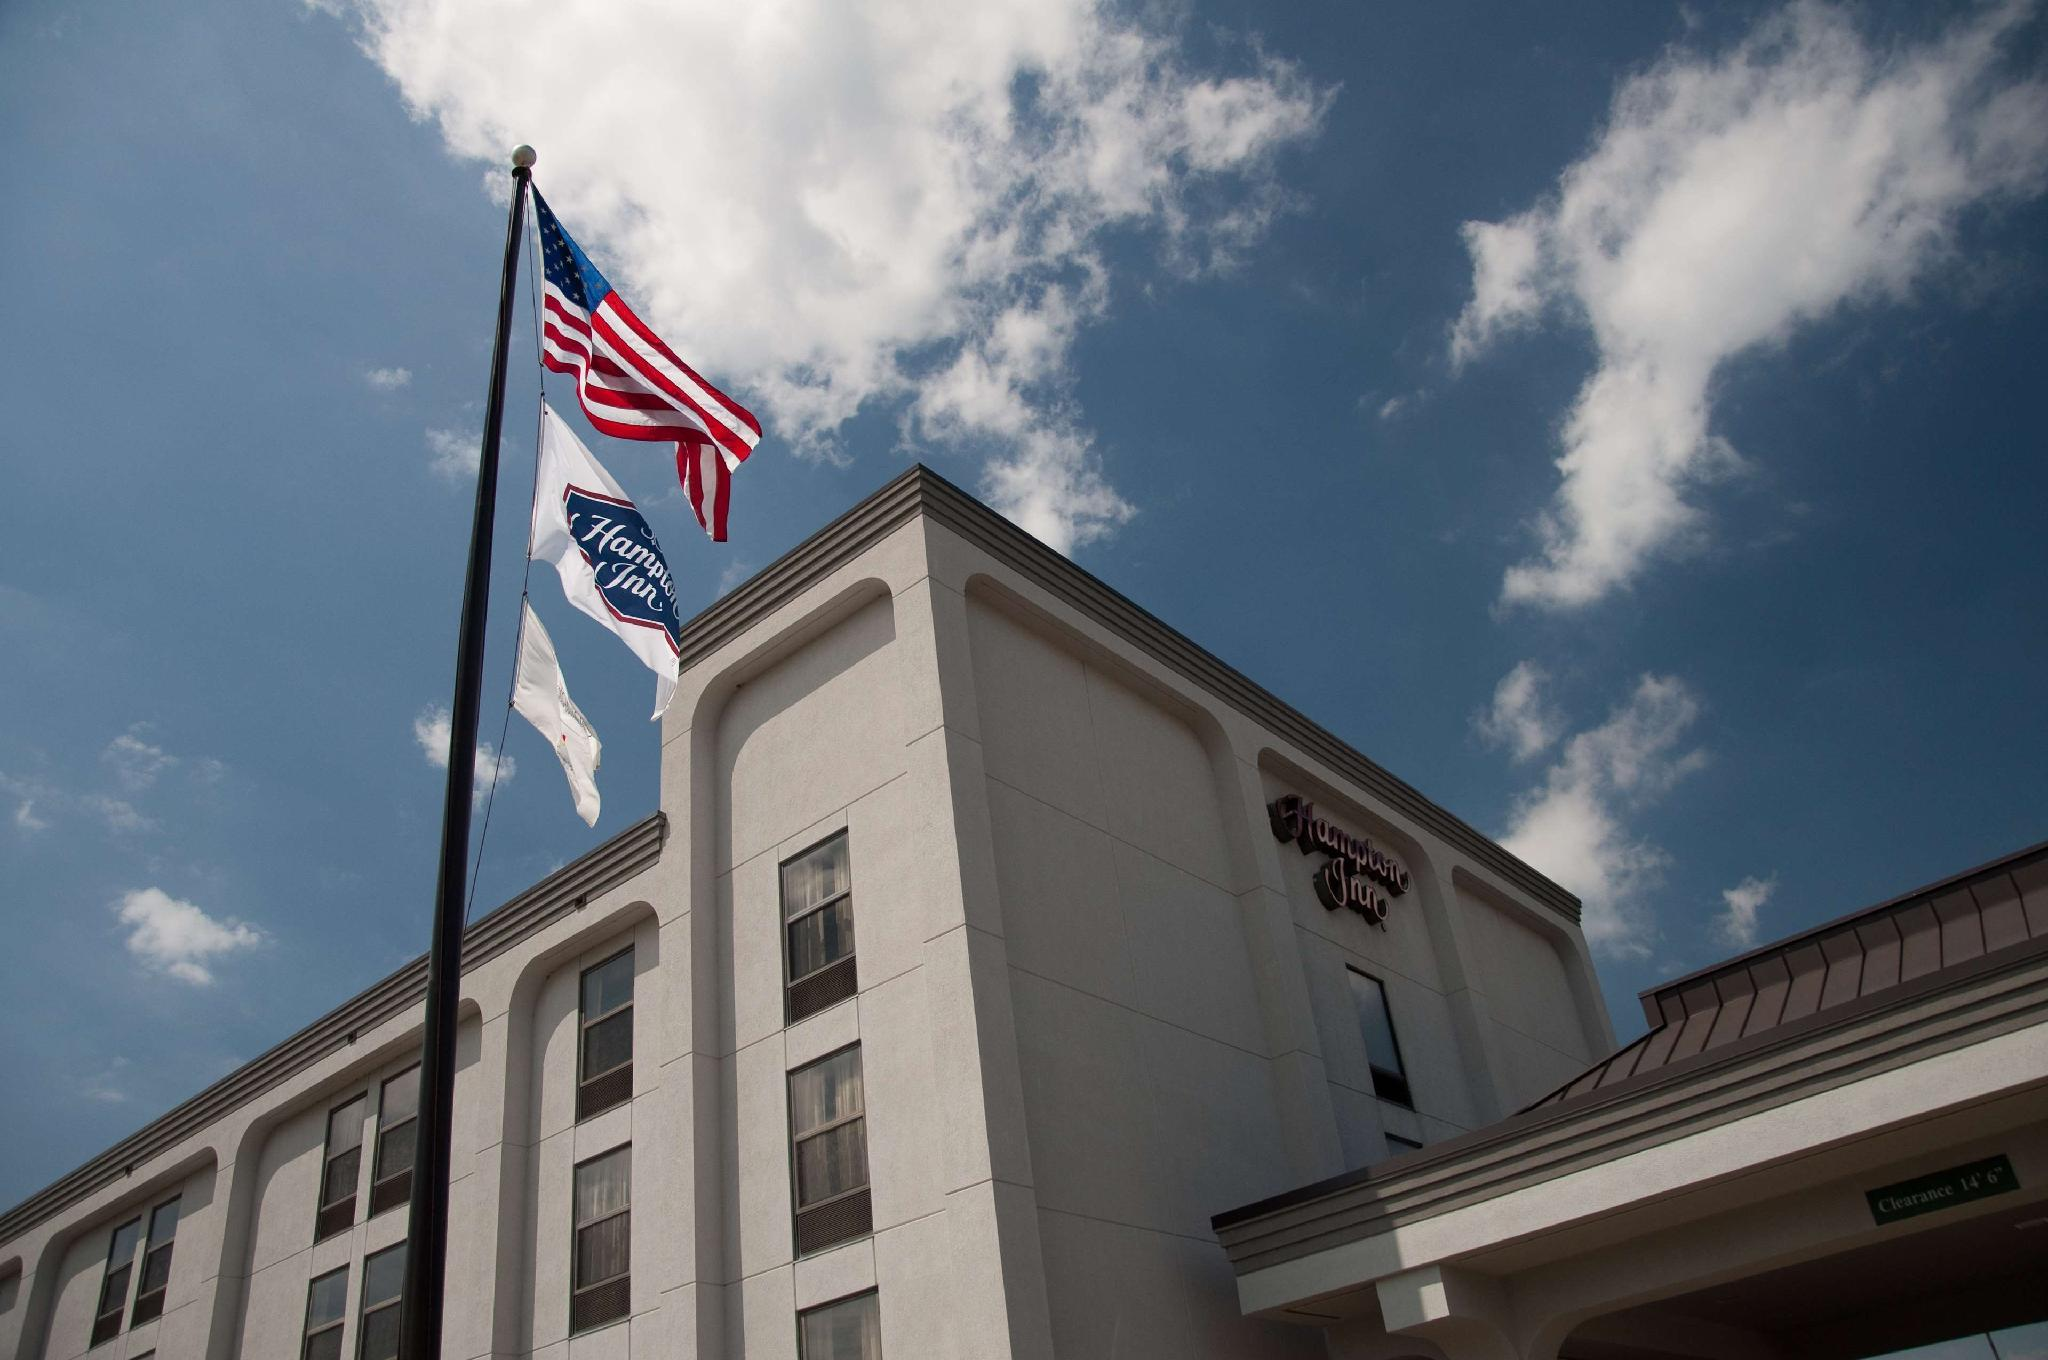 Hampton Inn Kansas City Shawnee Mission